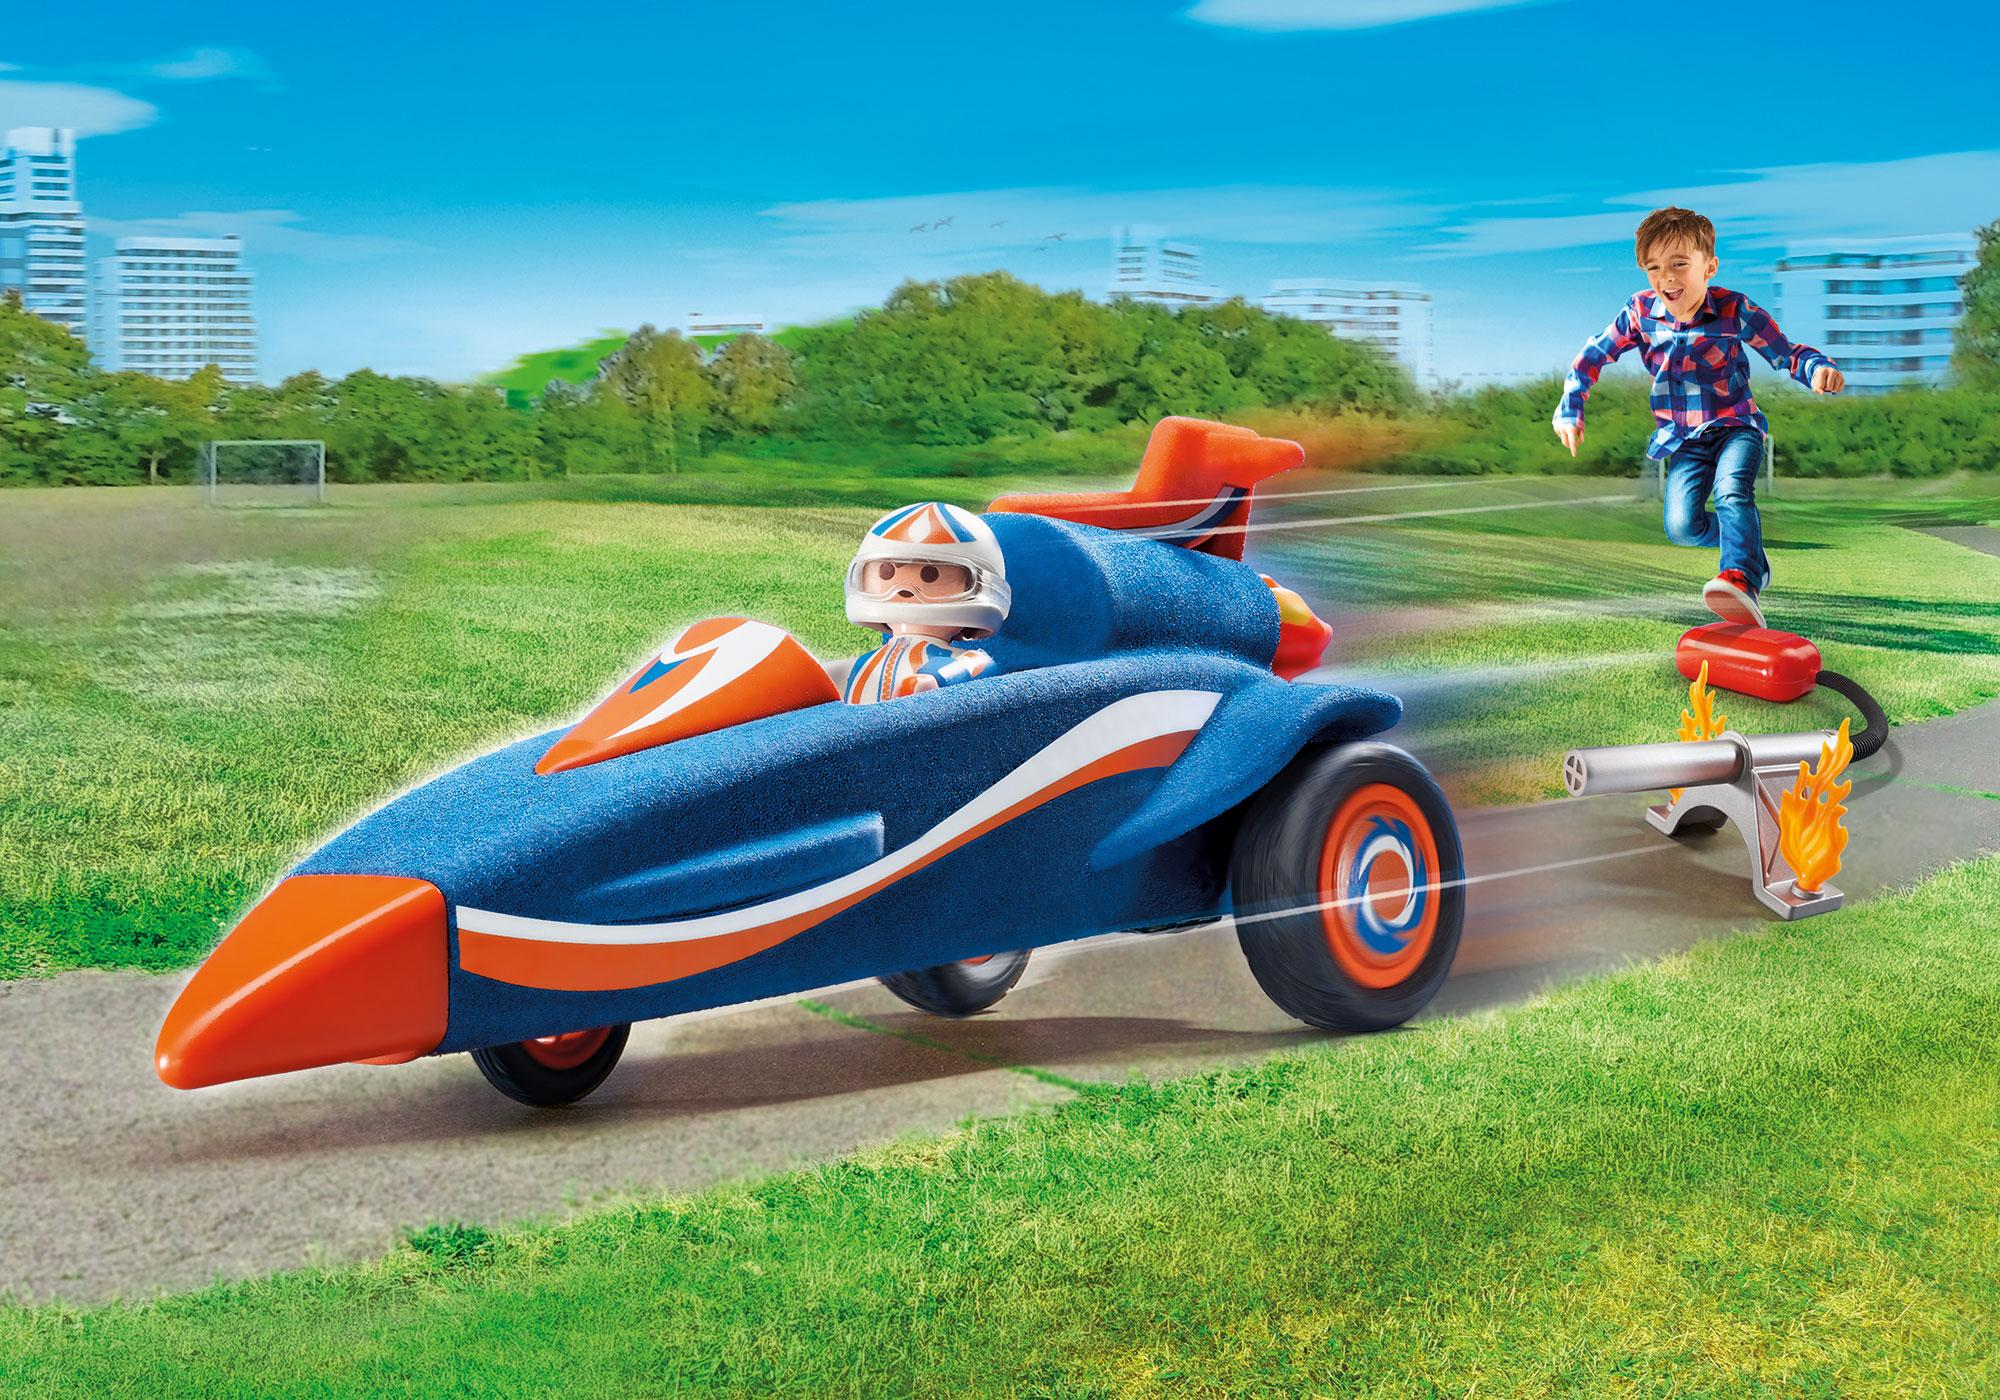 http://media.playmobil.com/i/playmobil/9375_product_detail/Pilote et voiture fusée